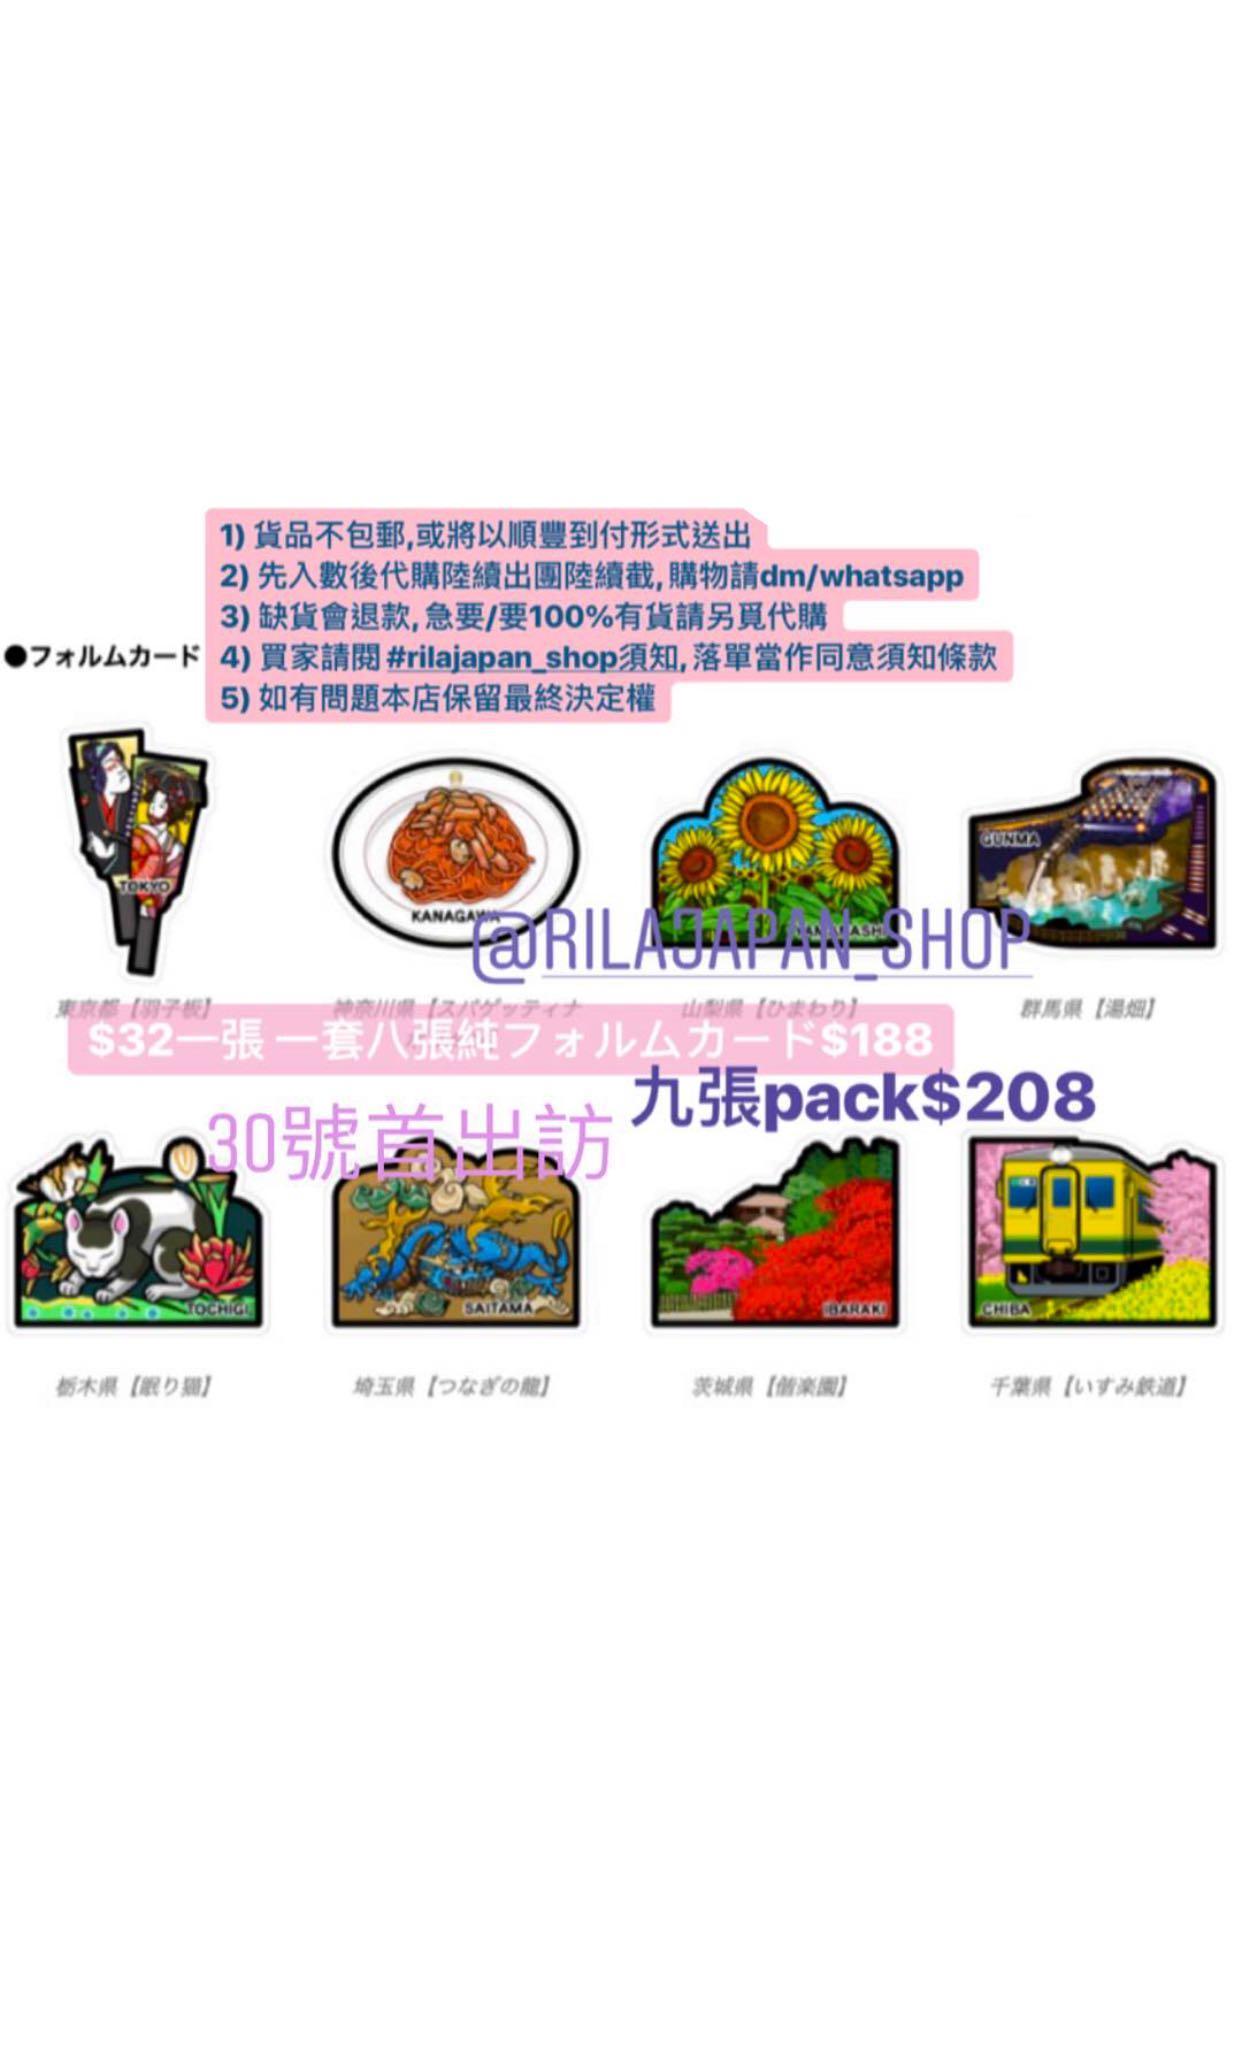 [hold] 日本郵便局新出第十彈明信片 Japanese Gotochi Formcards Version 10